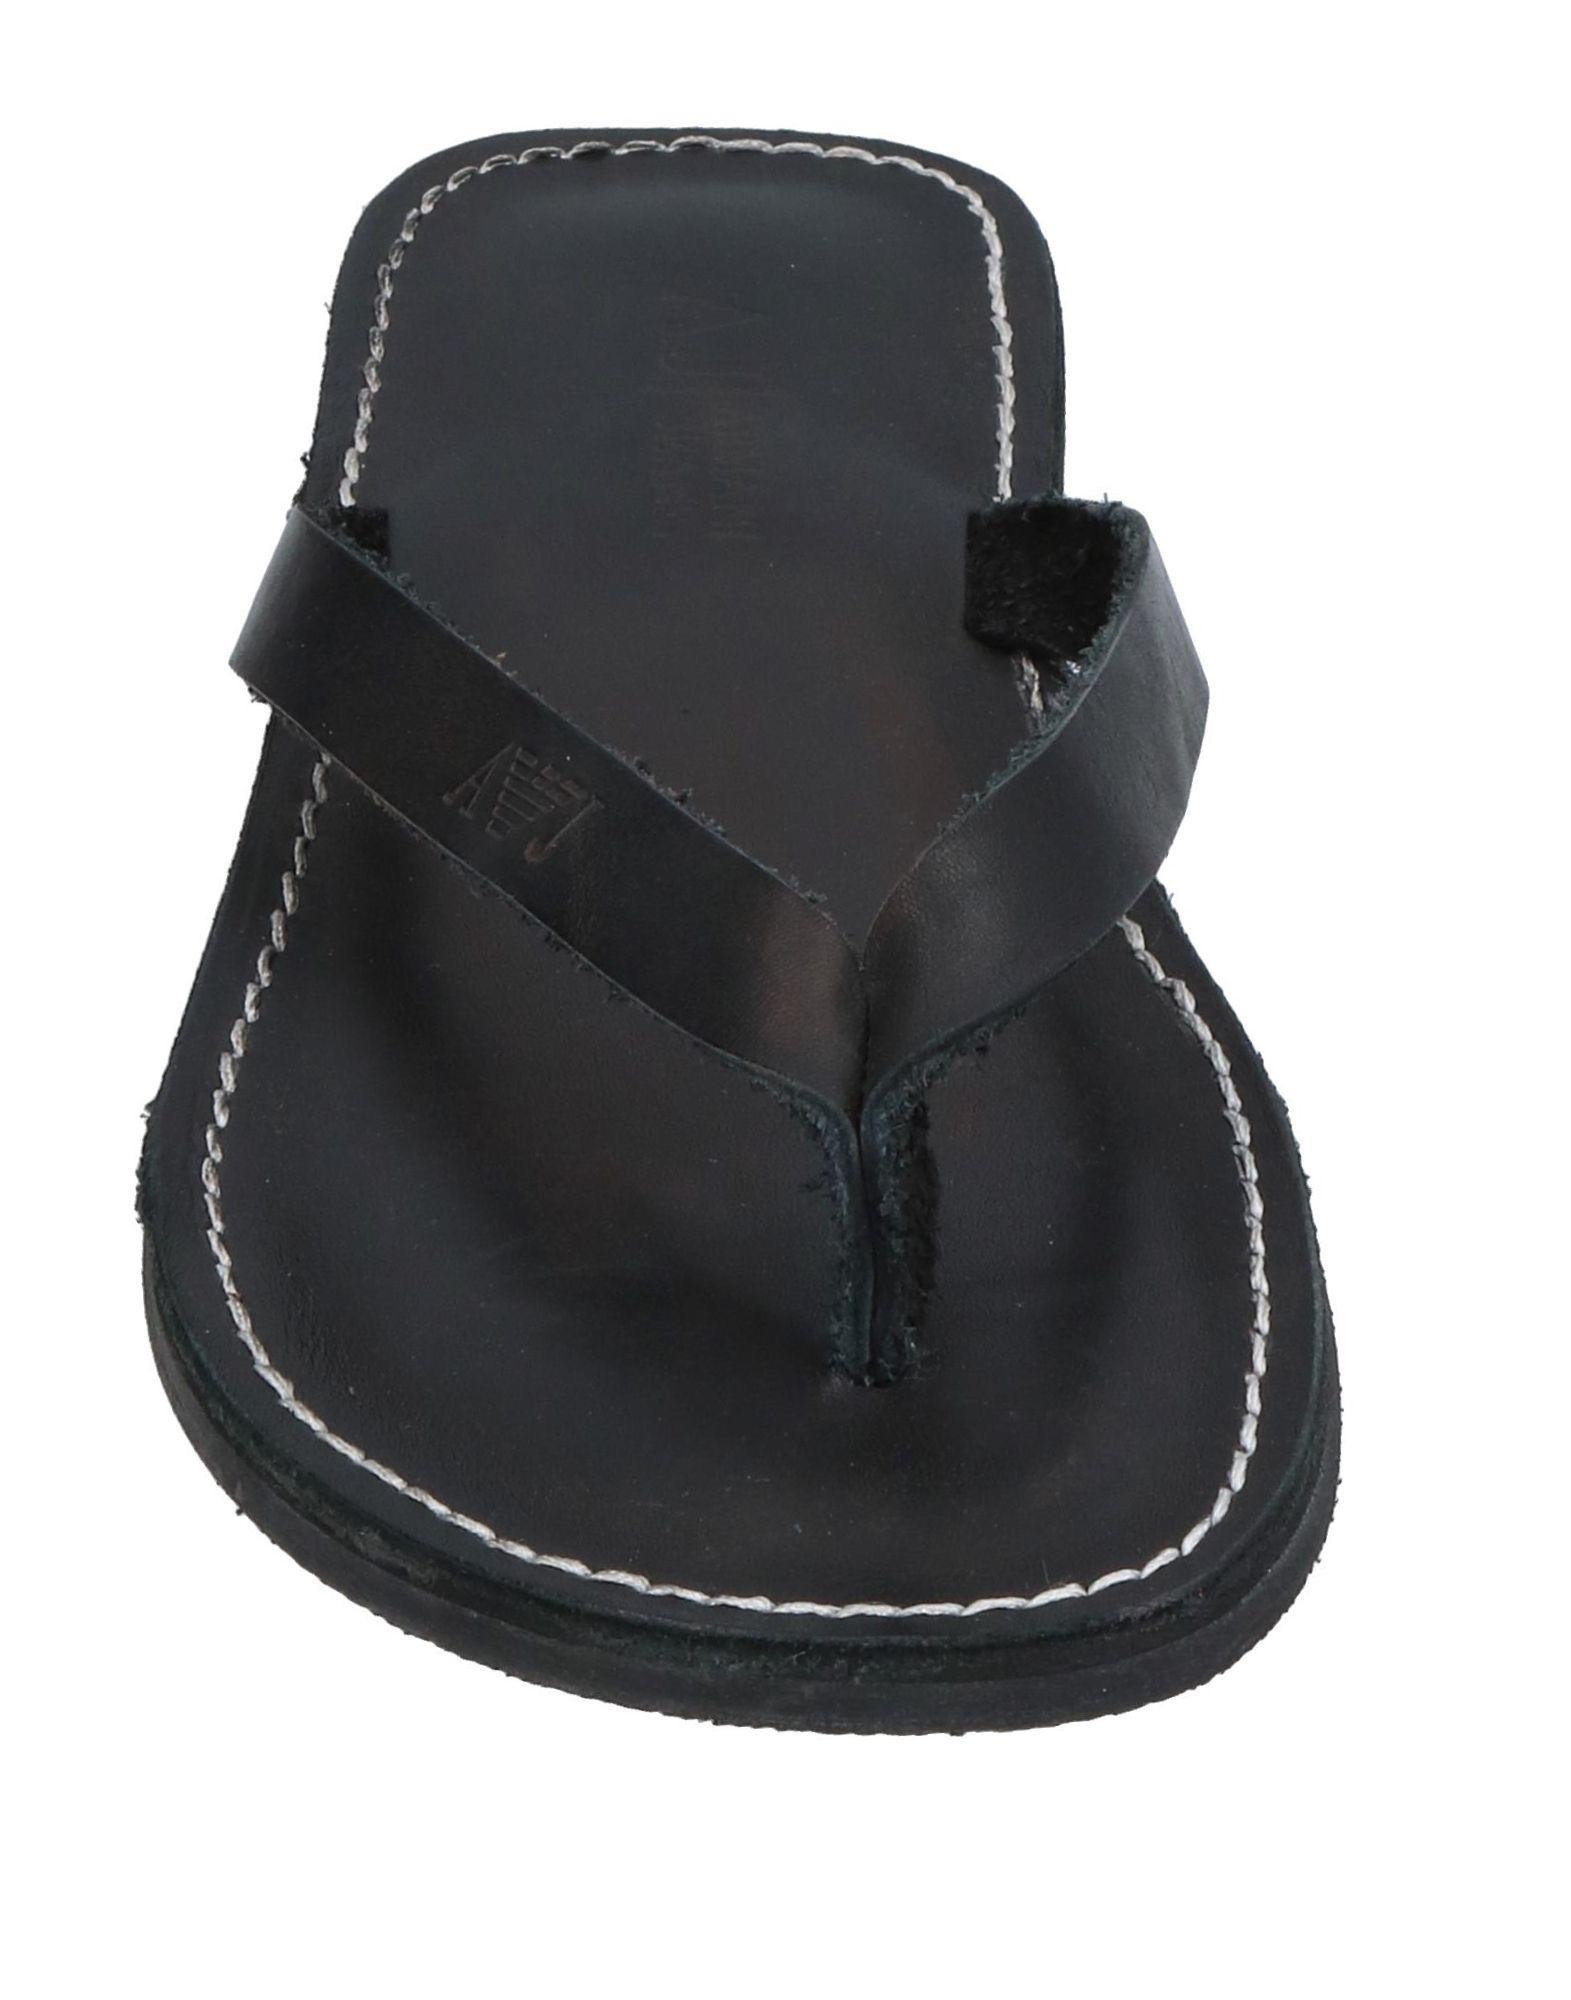 Rabatt echte Dianetten Schuhe Armani Jeans Dianetten echte Herren  11401021VV e74c63